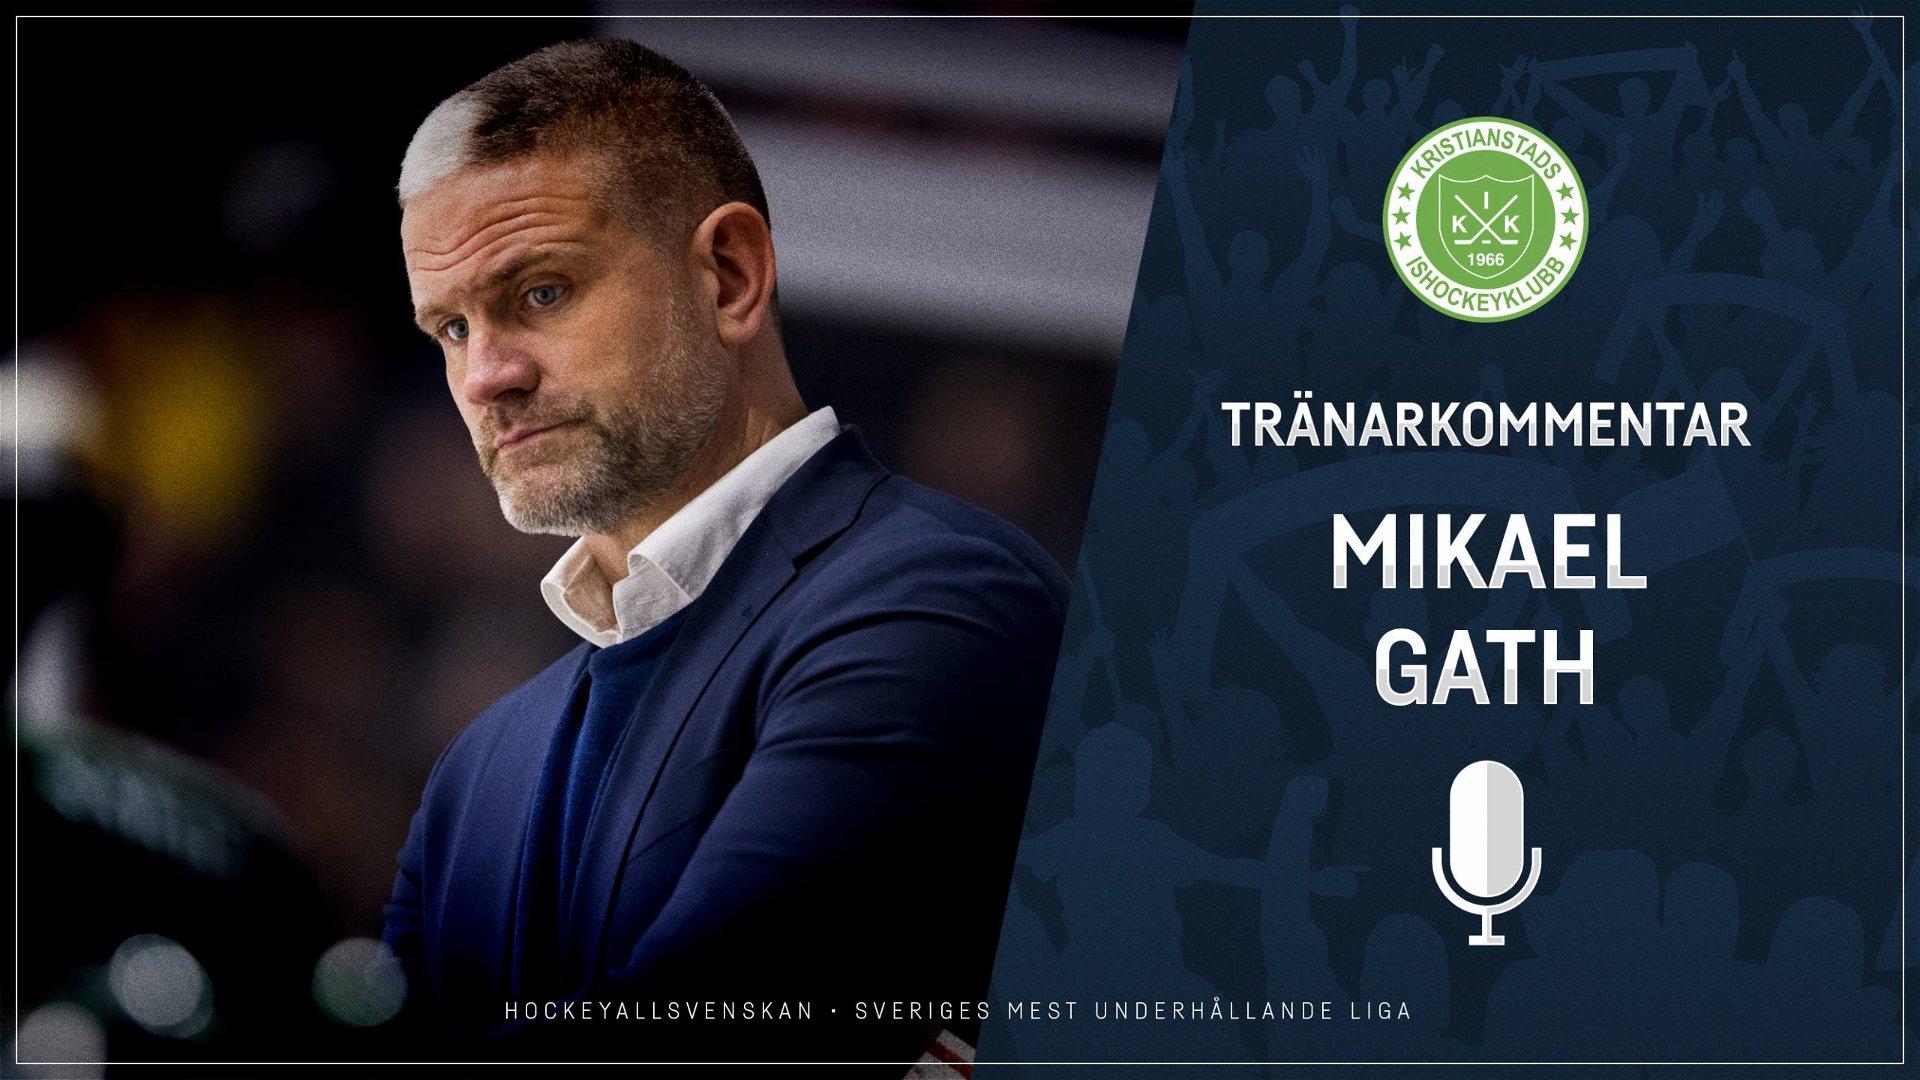 2020-11-25 Segerintervju: Mikael Gath